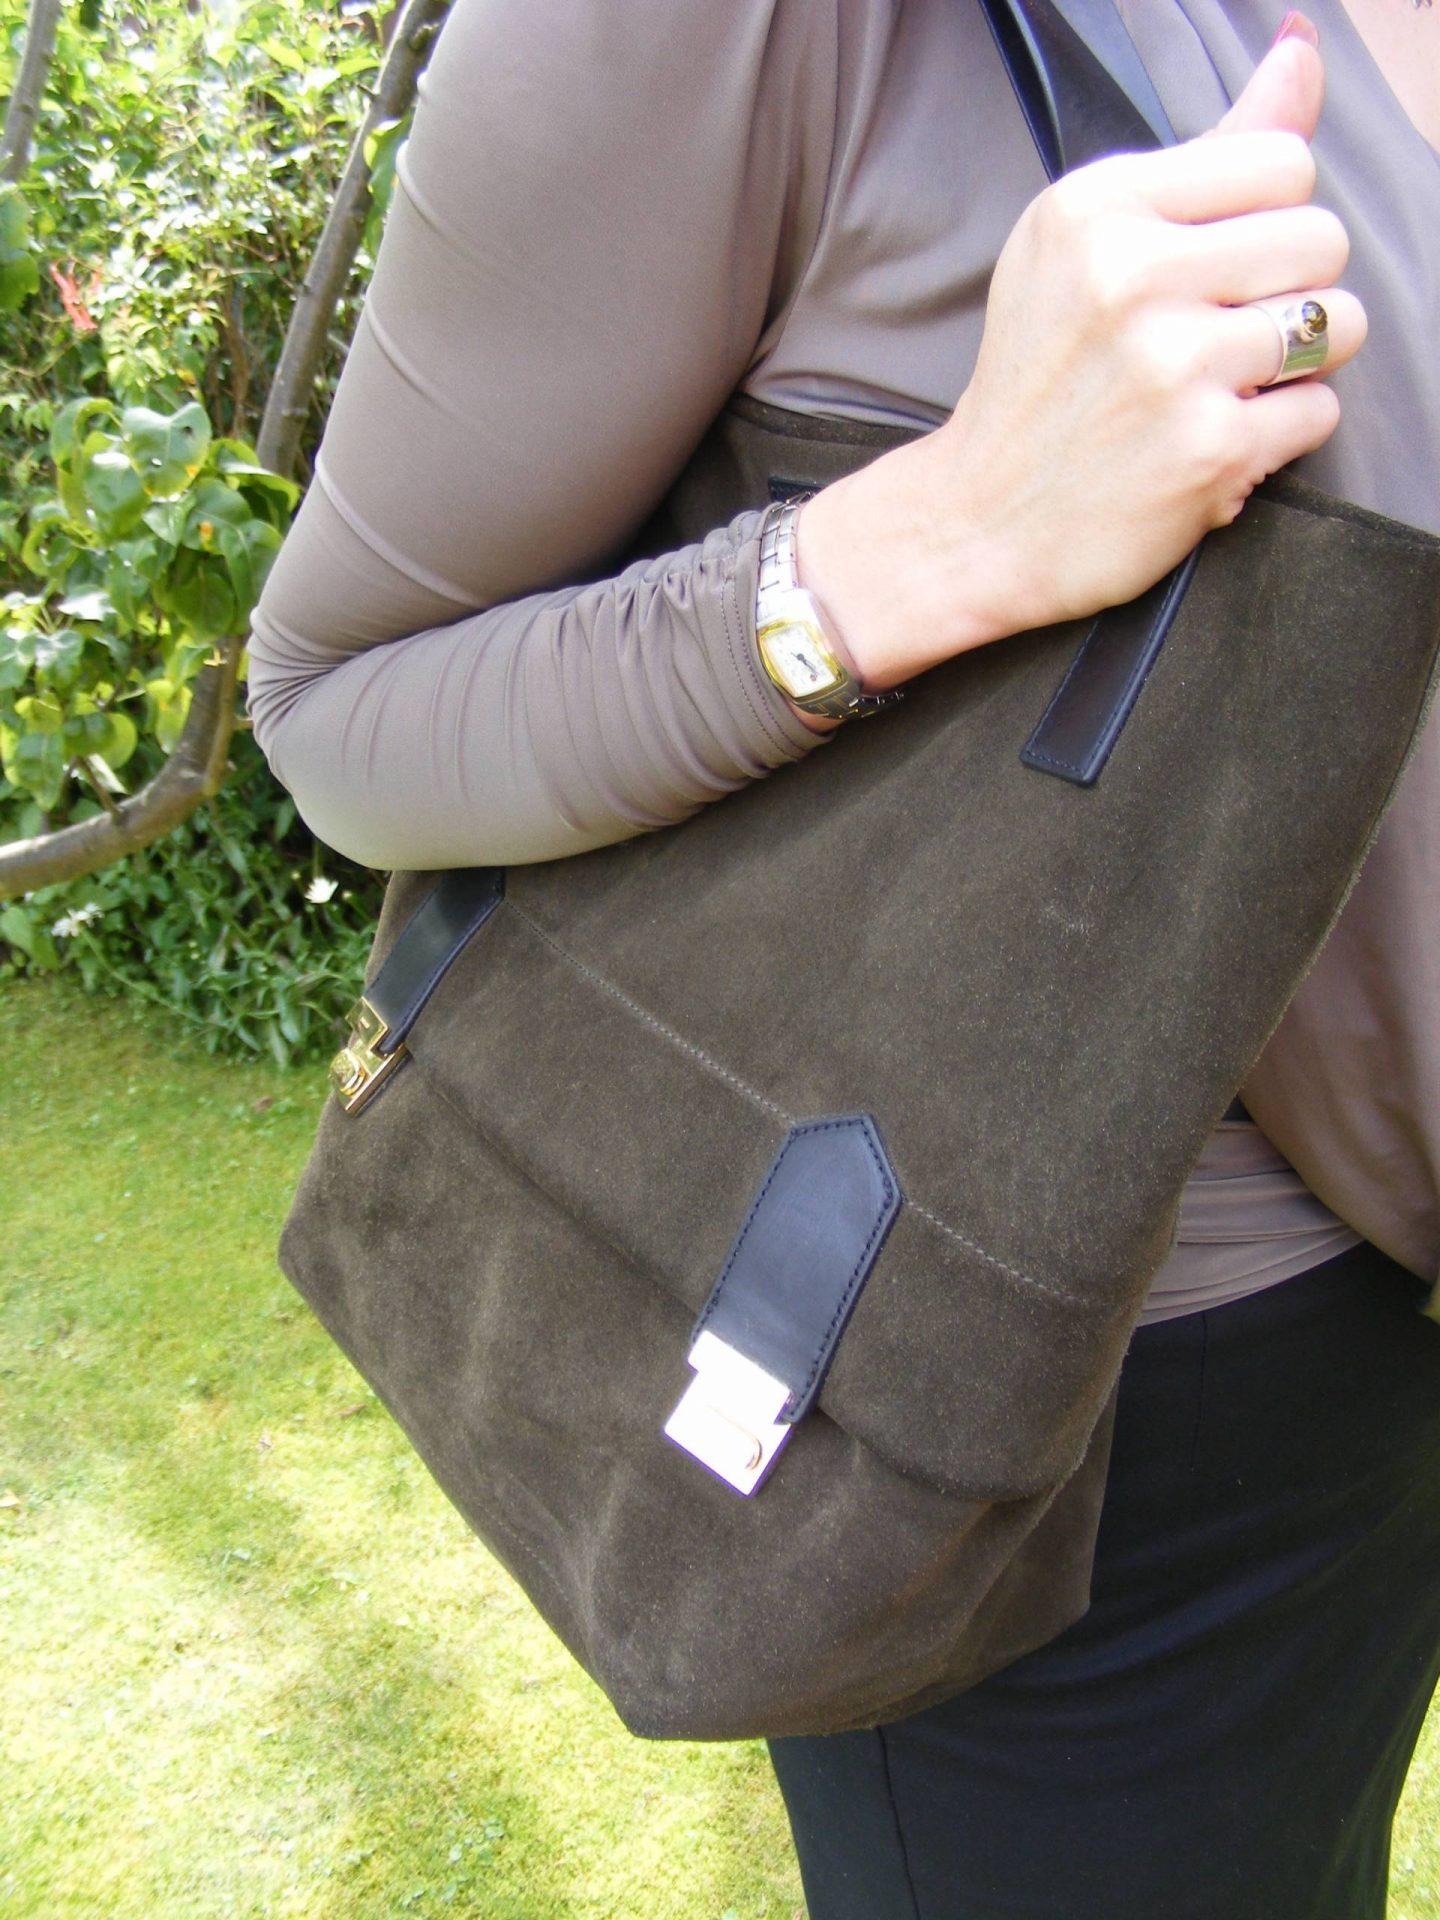 See by Chloe Pencil Skirt and Khaki Draped Top, Jaeger khaki suede bag